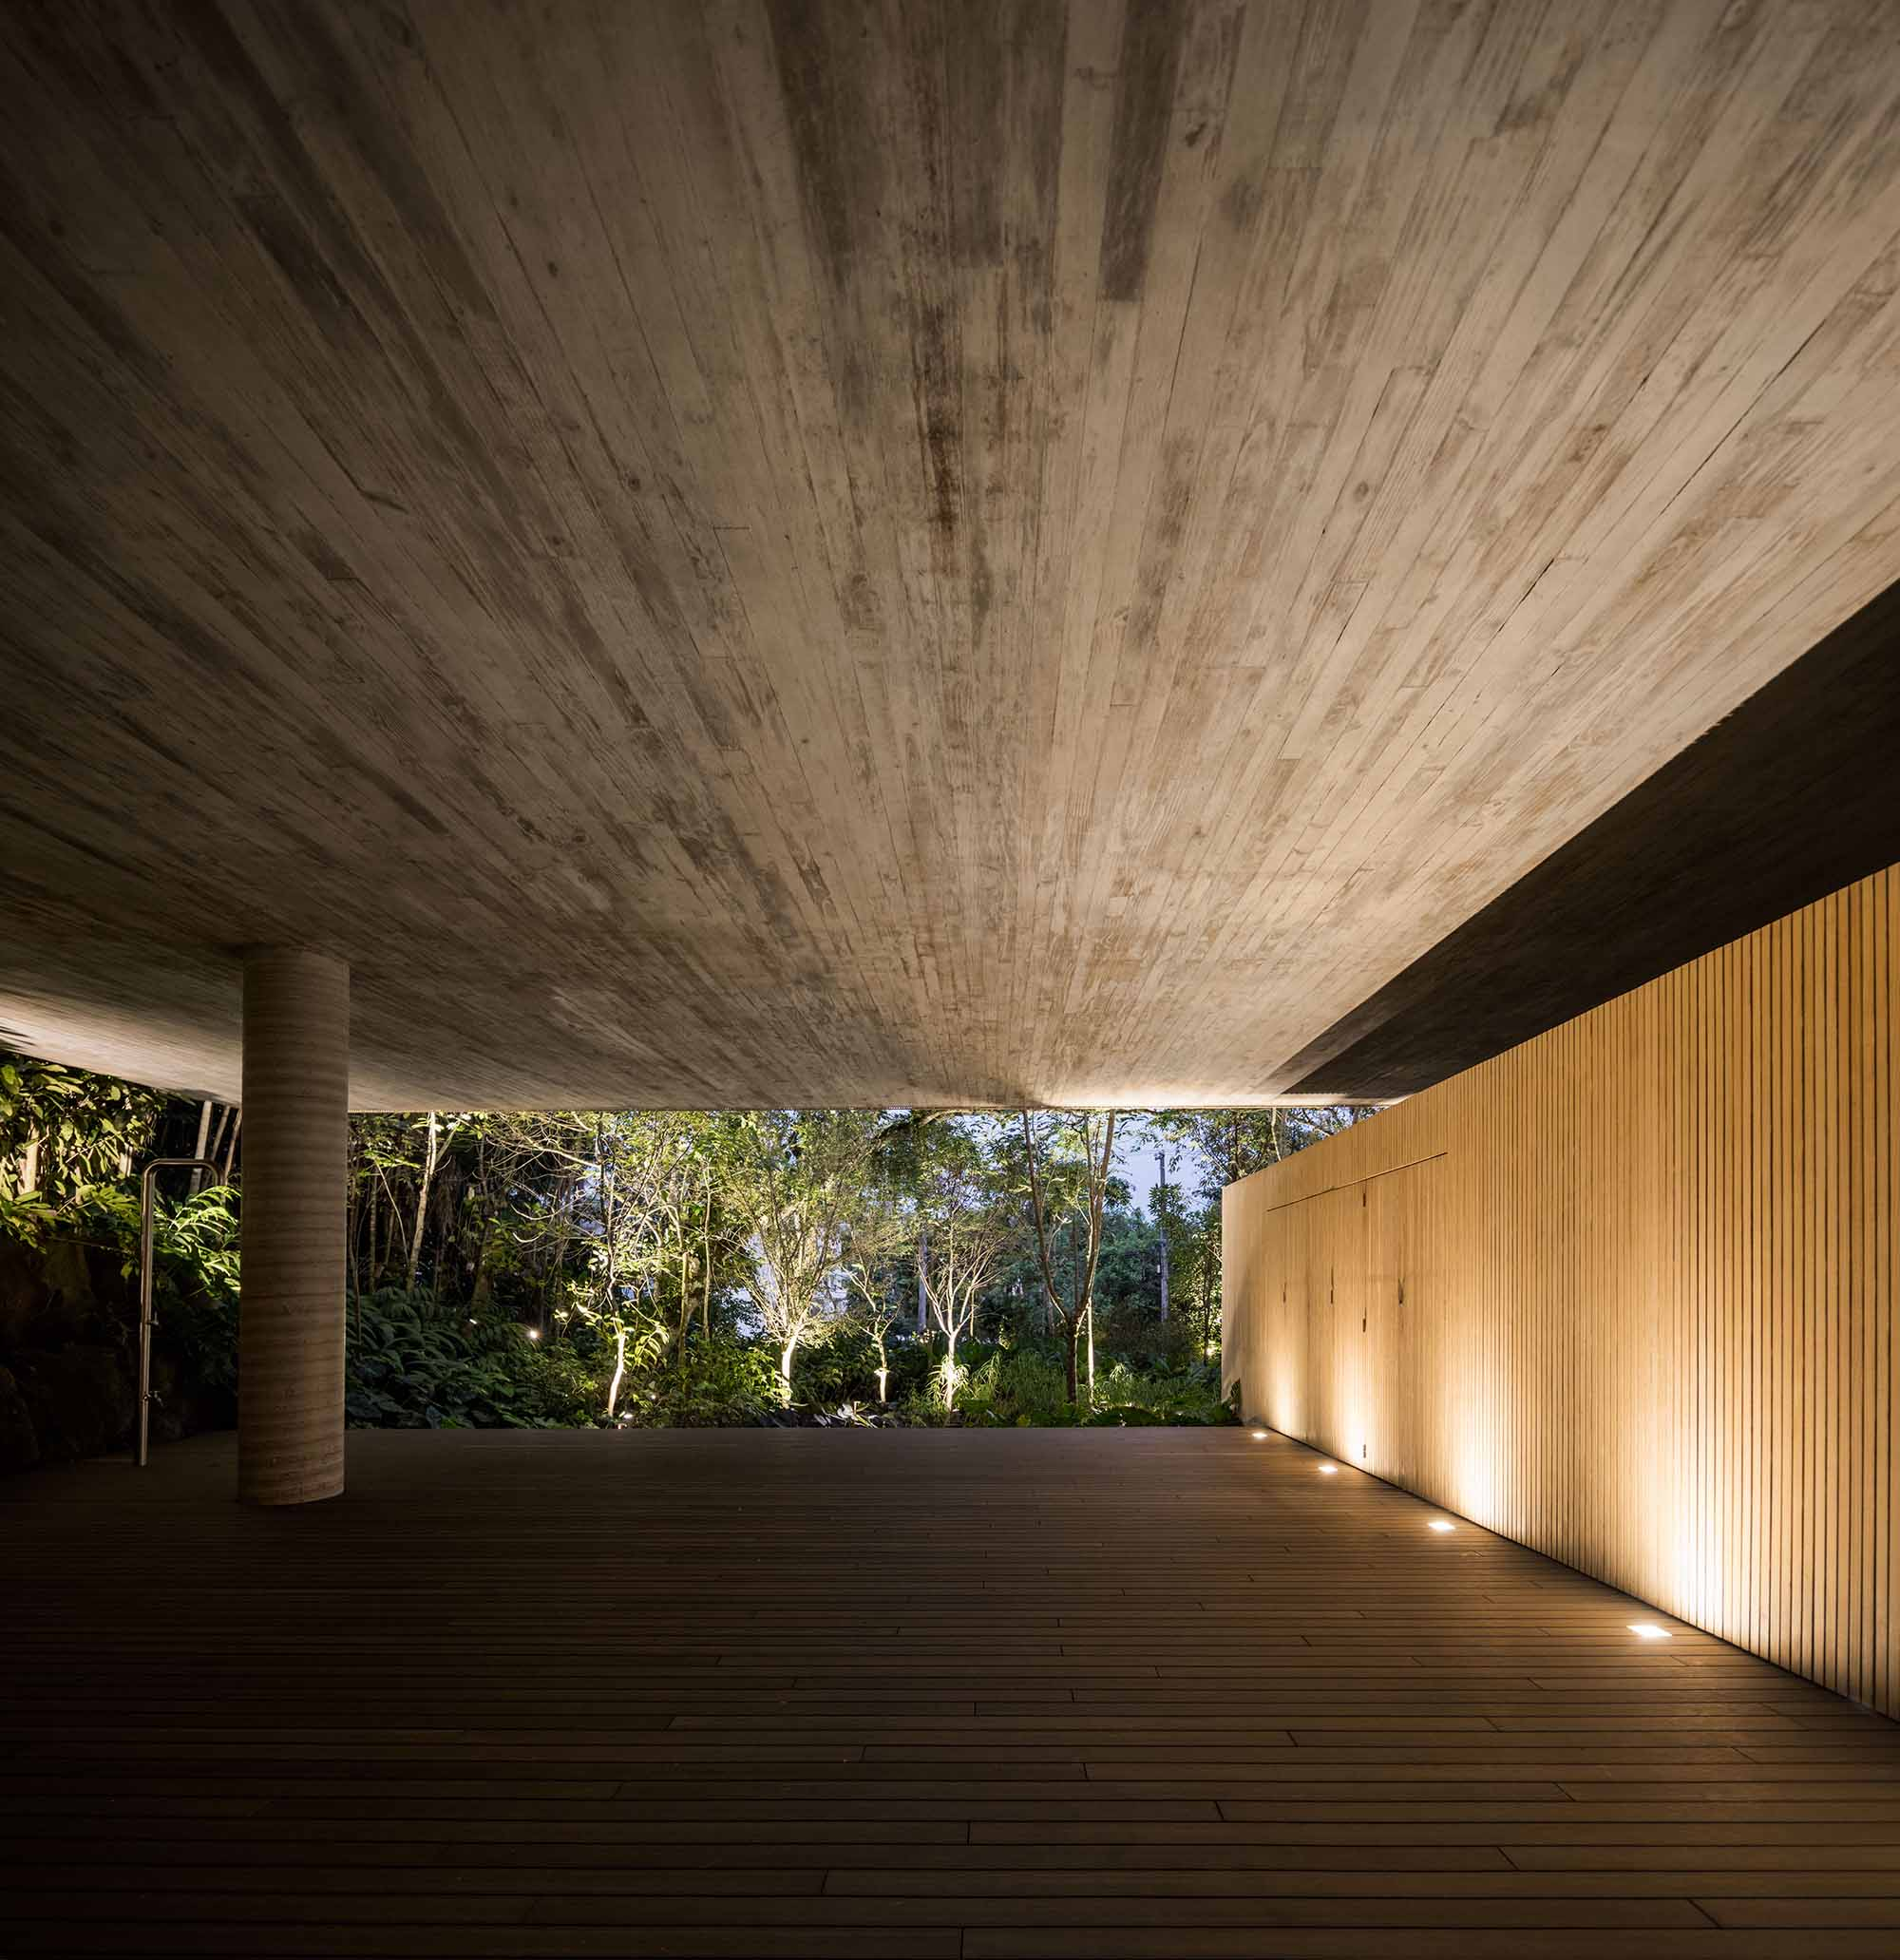 H-House-Life-Jungle-House-Casa-Da-Mata-studio-mk27-mk27_namata_fernandoguerra_medium(12).JPG